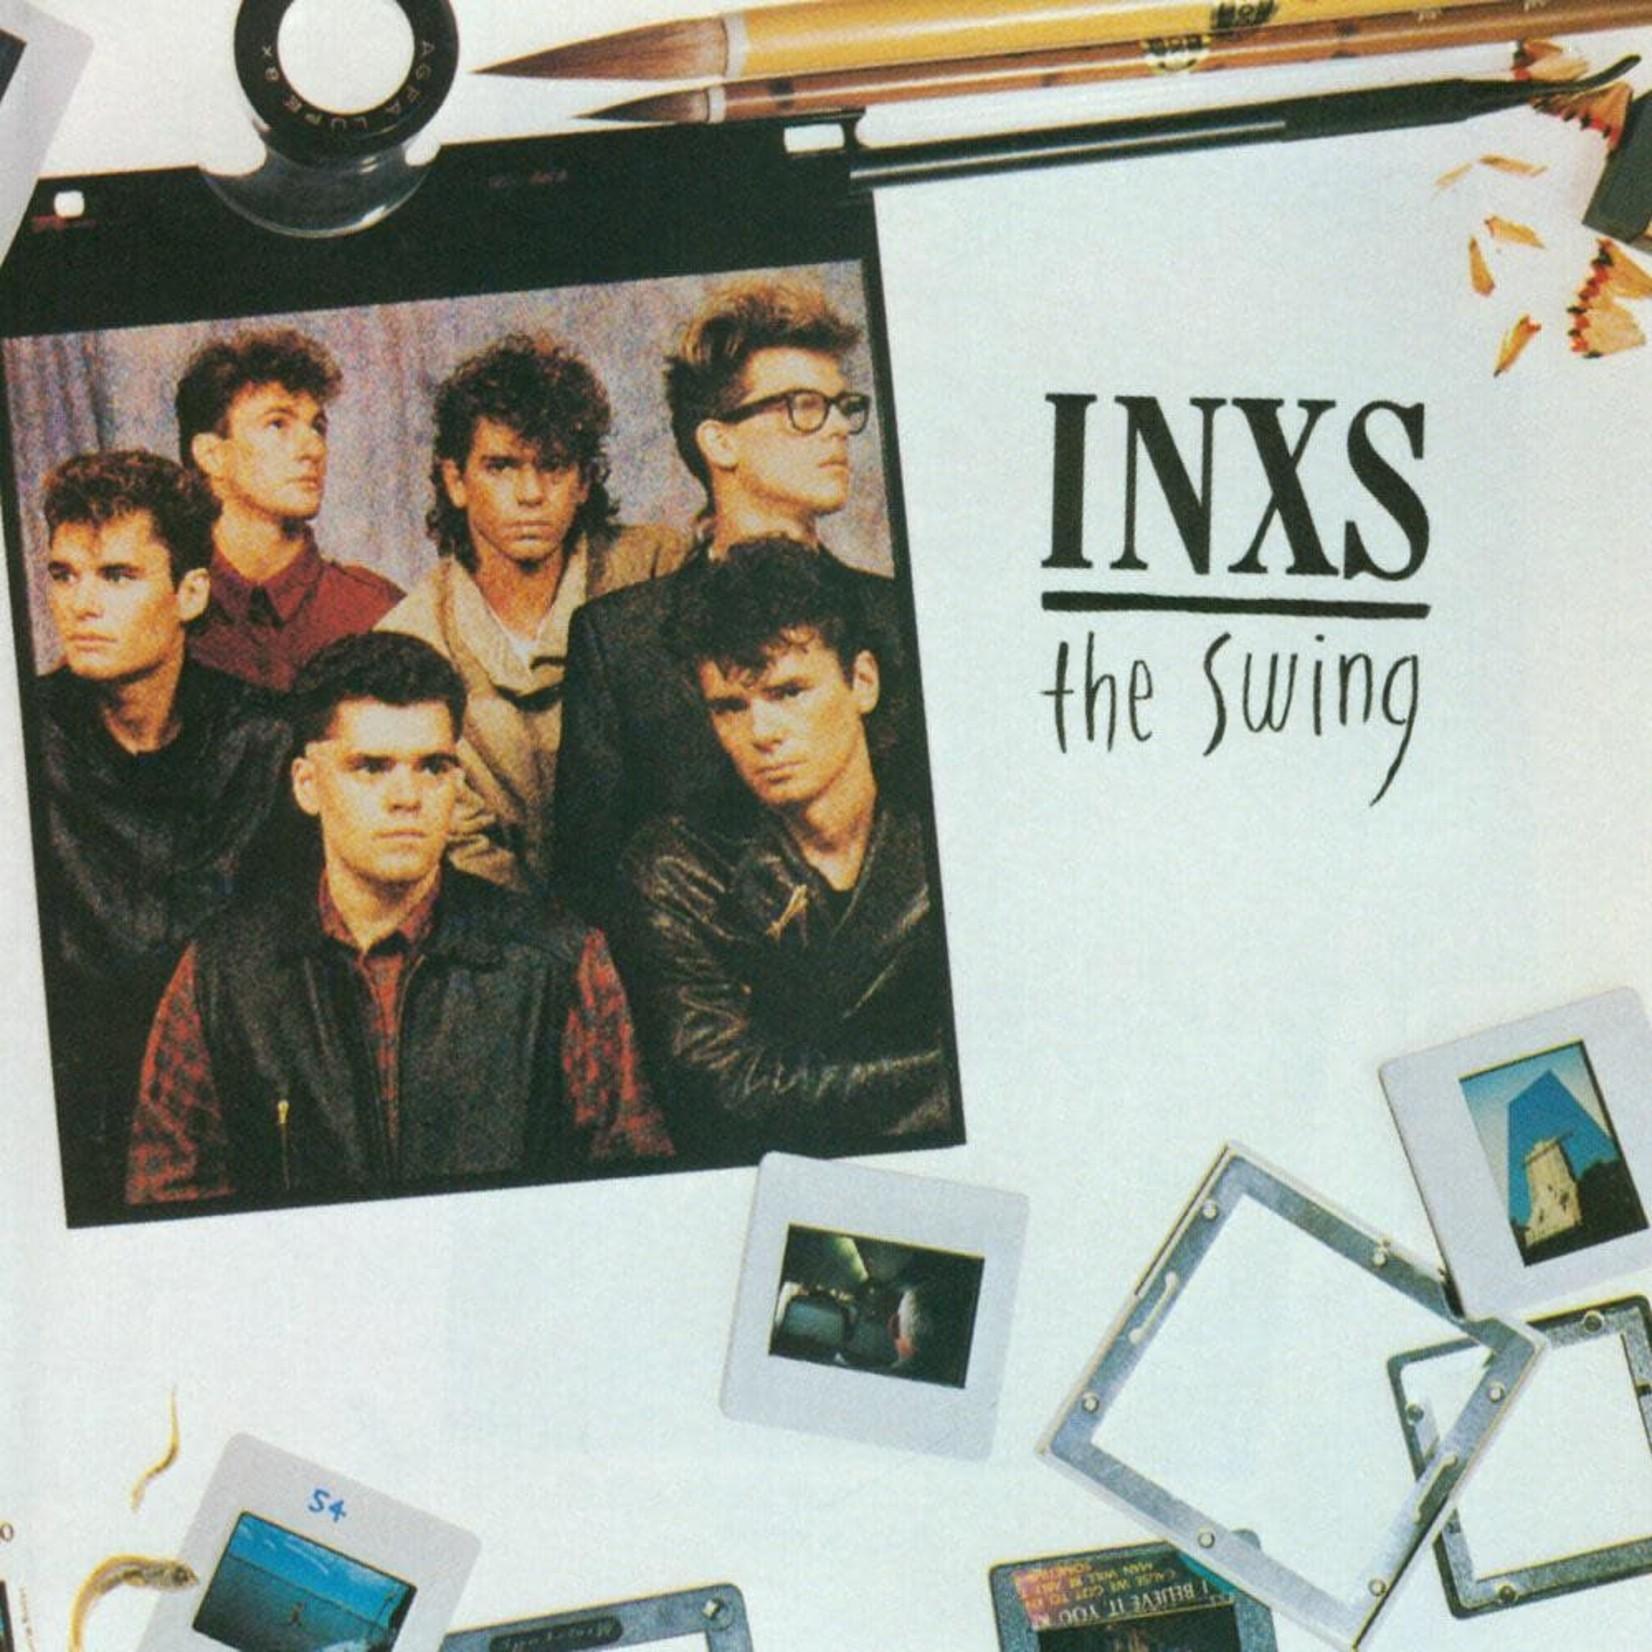 [Vintage] INXS: The Swing